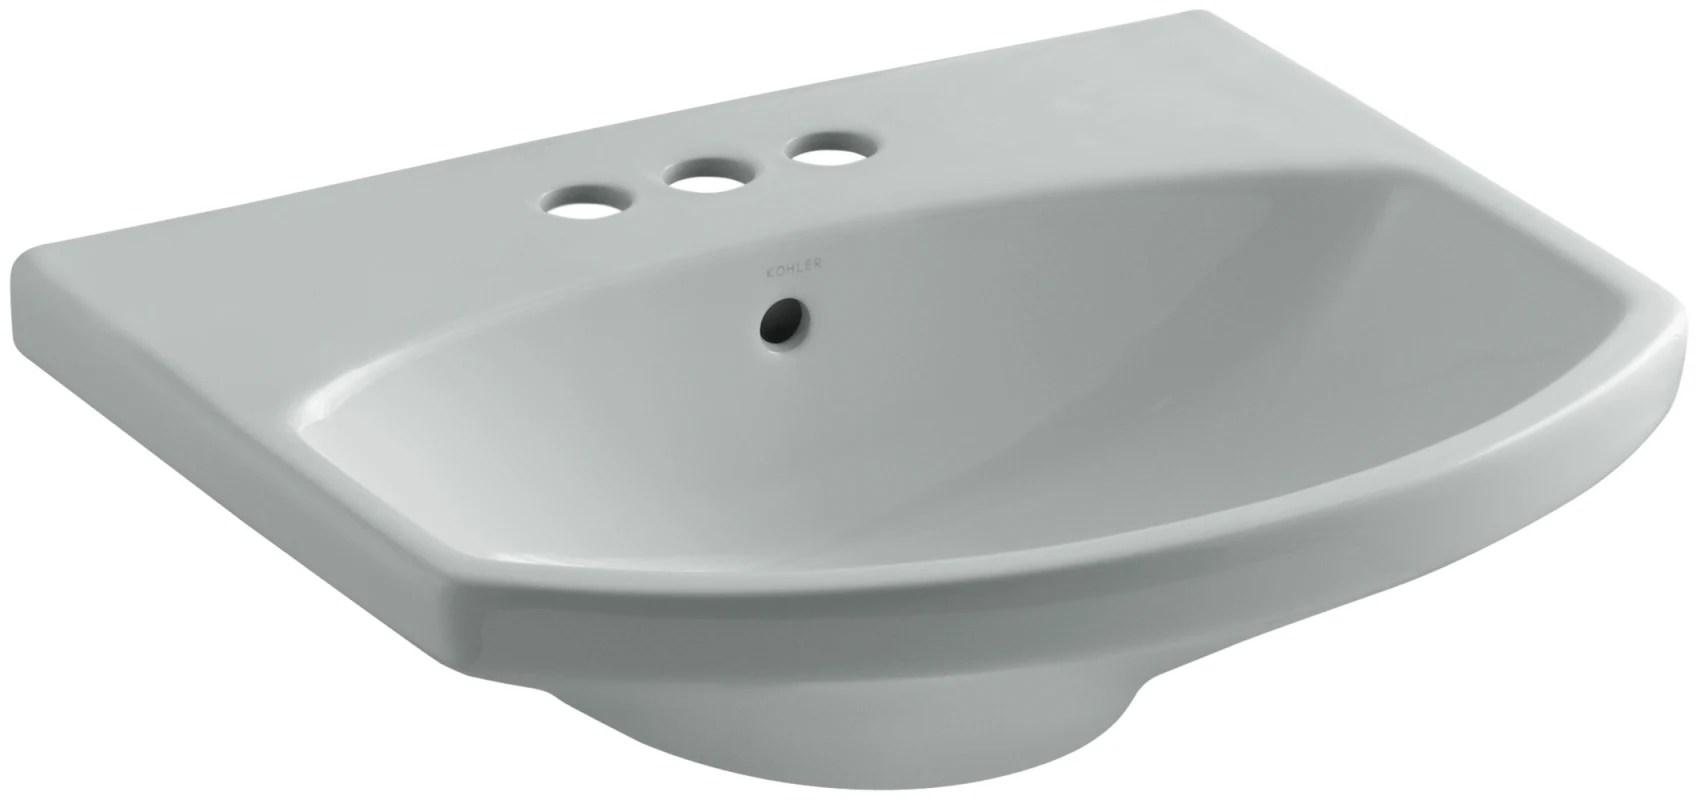 Sterling Sacramento 33 Pedestal Bathroom Sink With